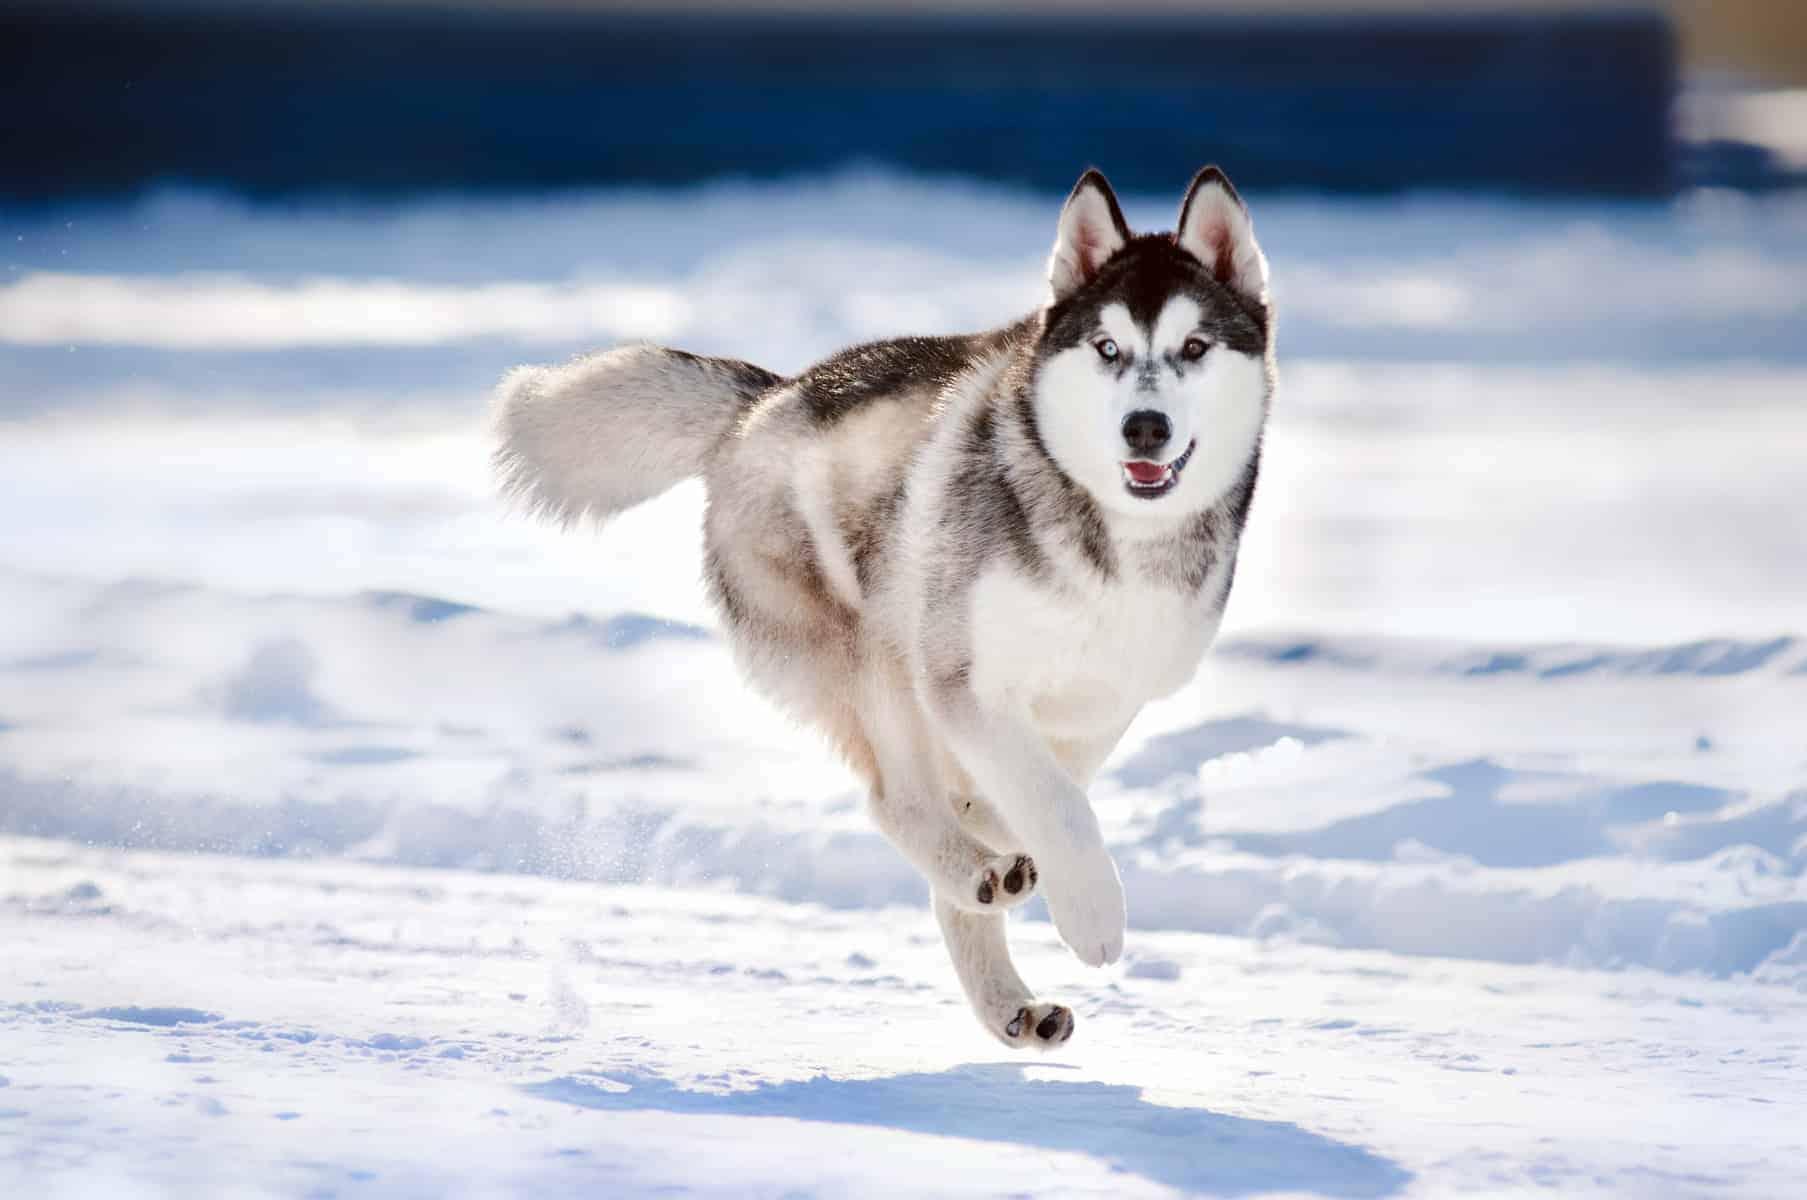 Siberian huskies off leash - Pictures of siberian huskies ...